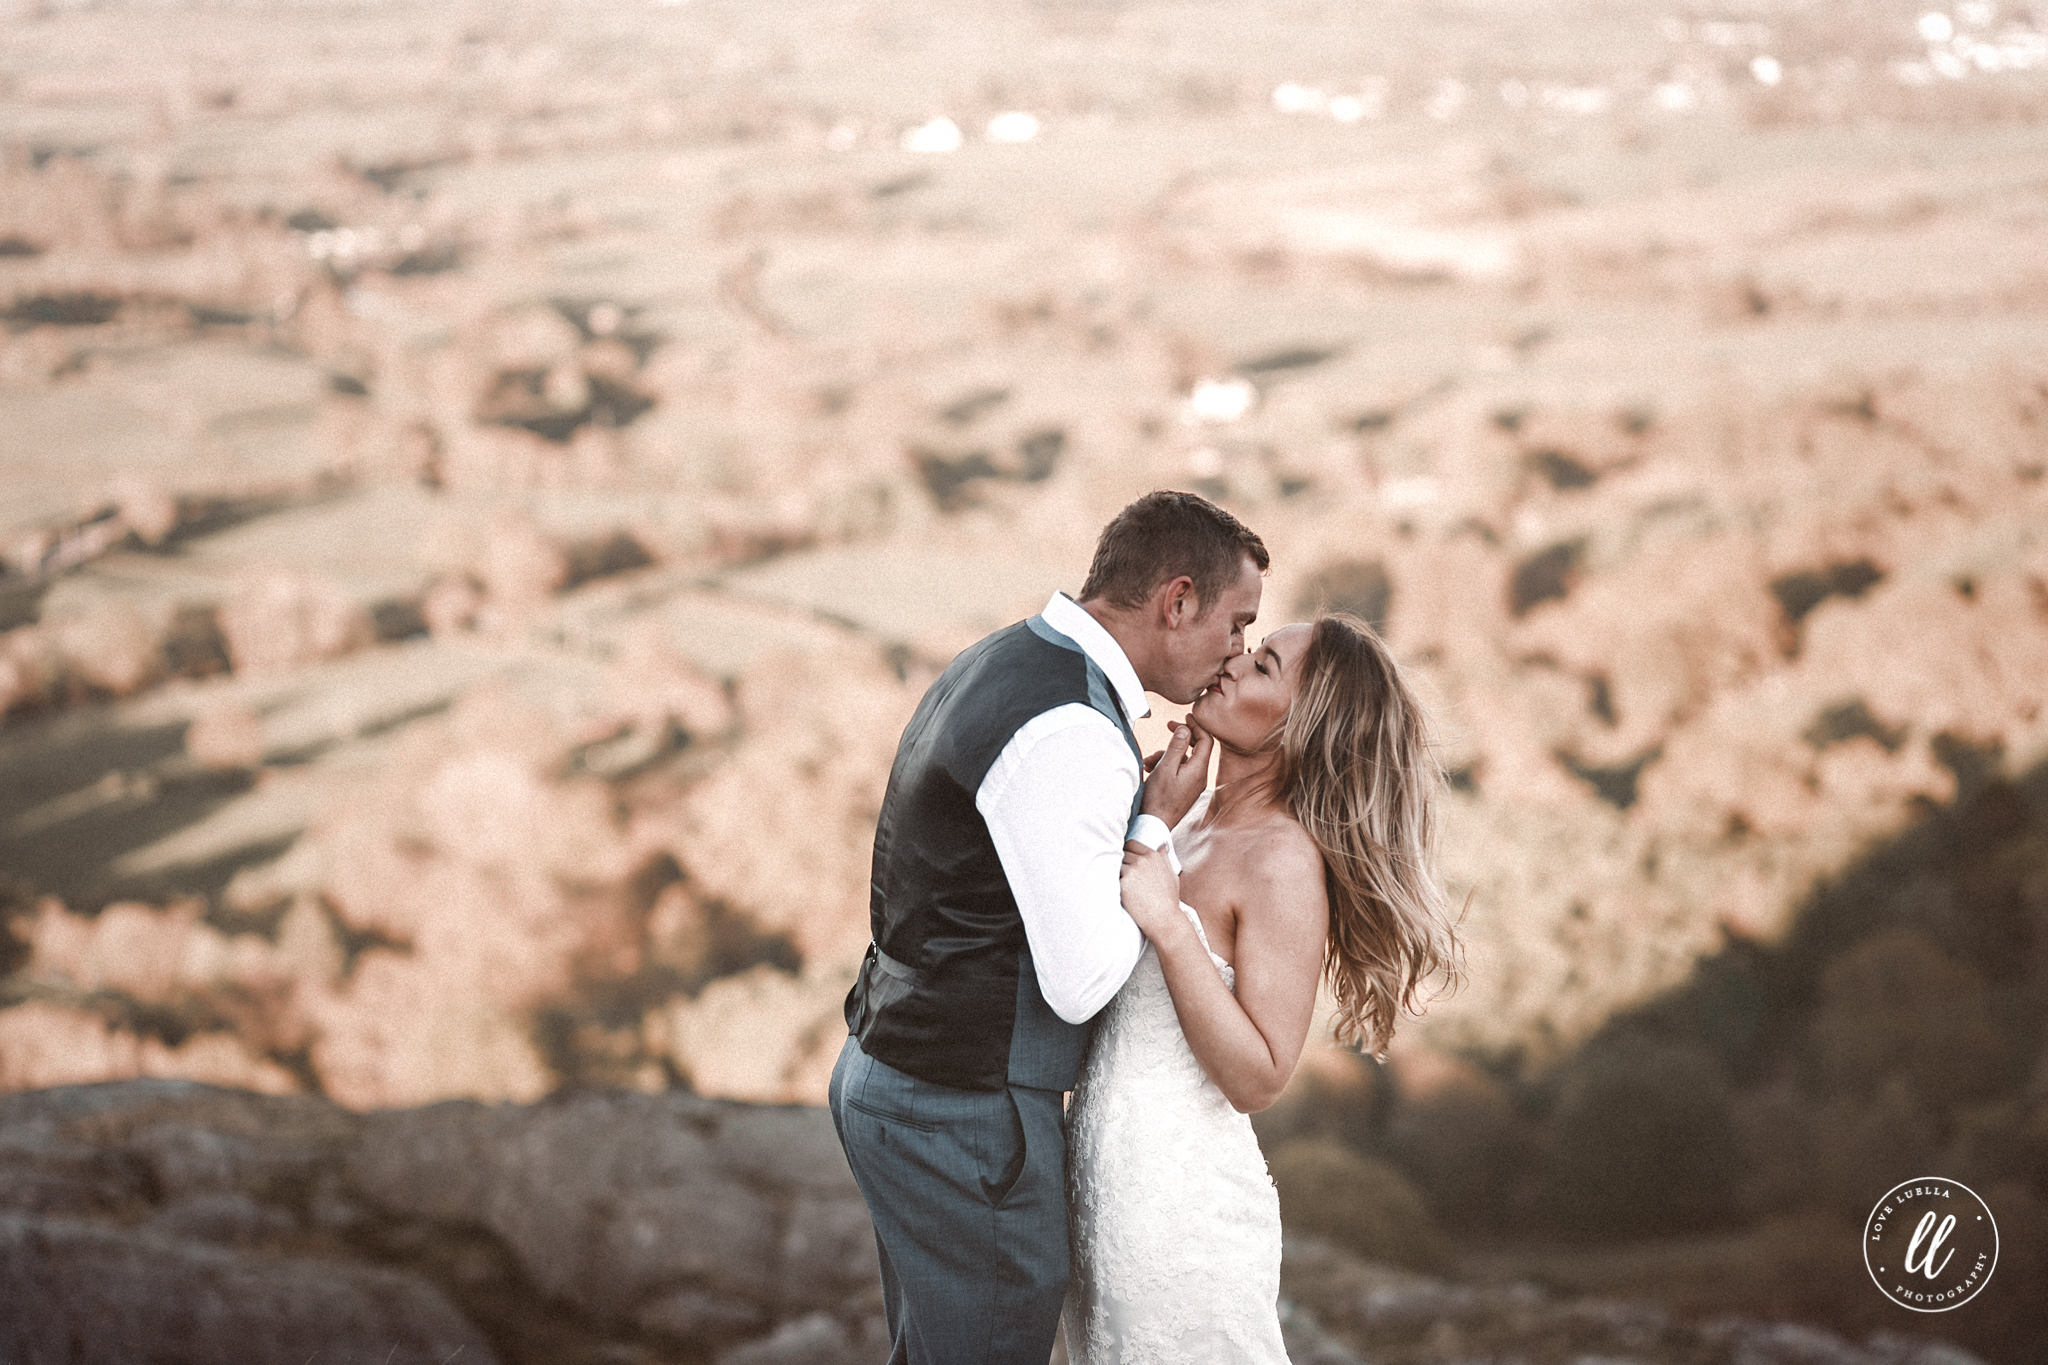 Snowdonia Post Wedding Shoot- Love Luella Photography-35.jpg